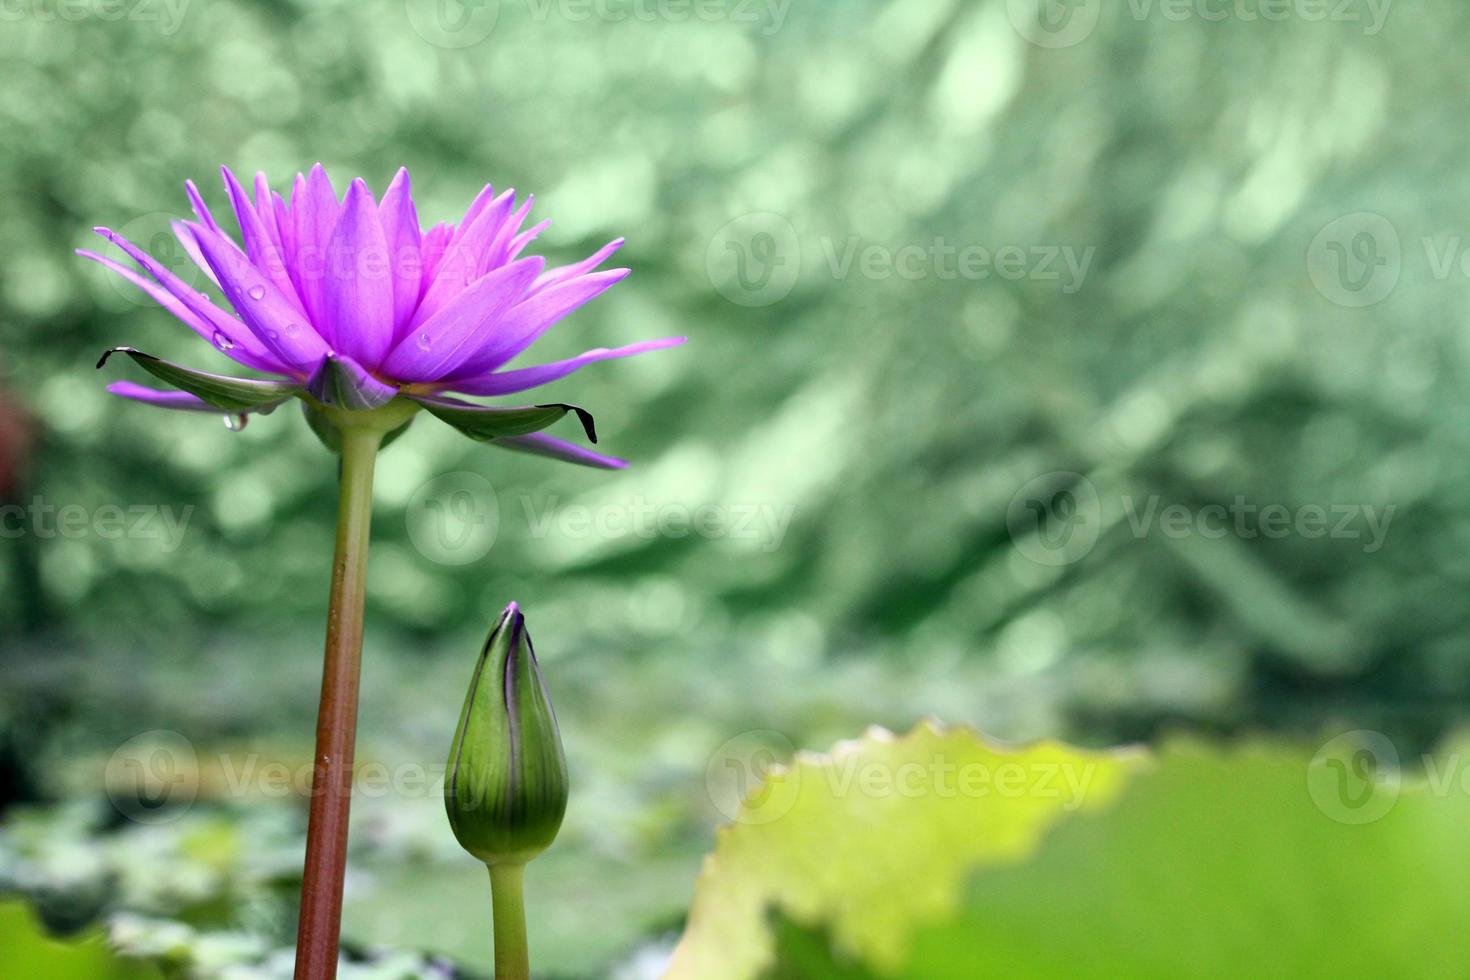 lotusblomma med grön bokehbakgrund foto